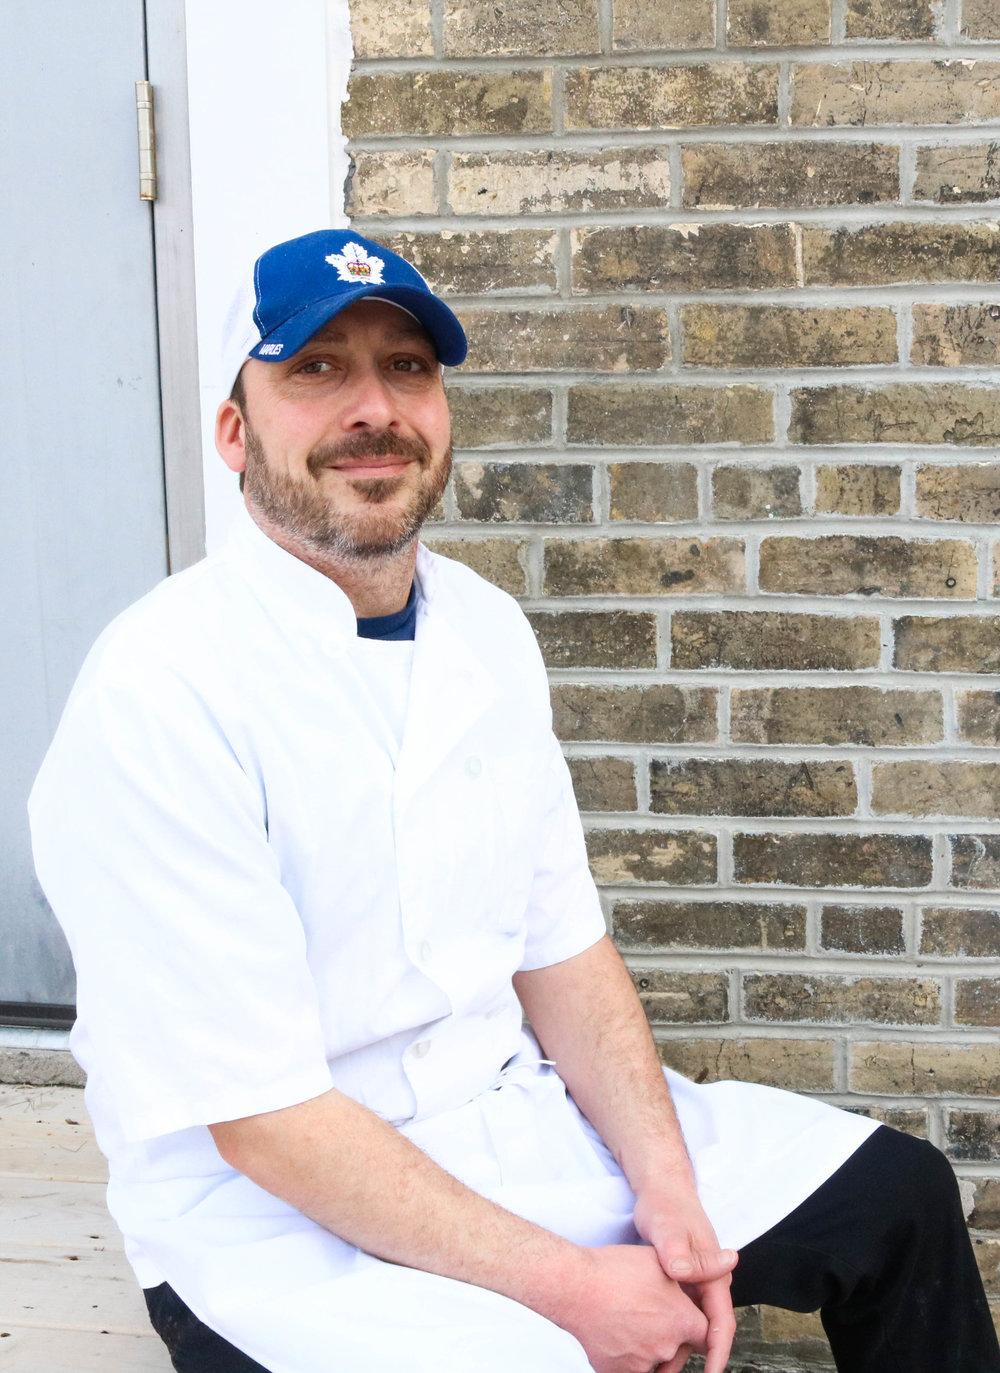 Lee Black, Executive Chef